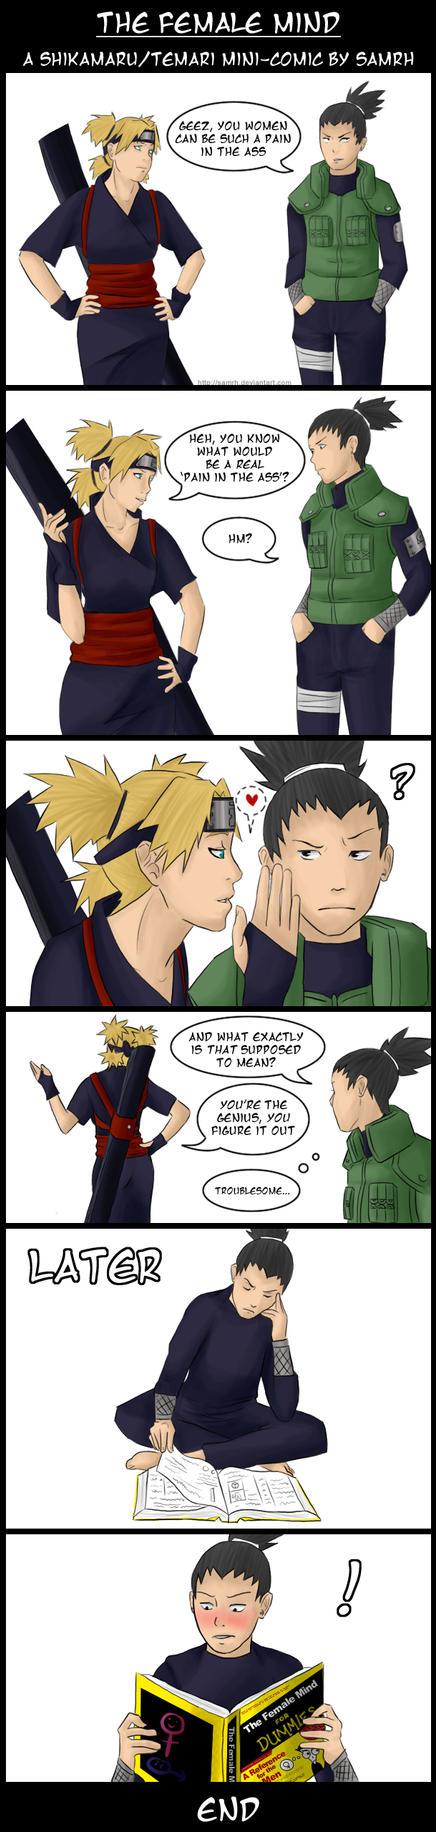 Naruto- Comic: The Female Mind by SamRH